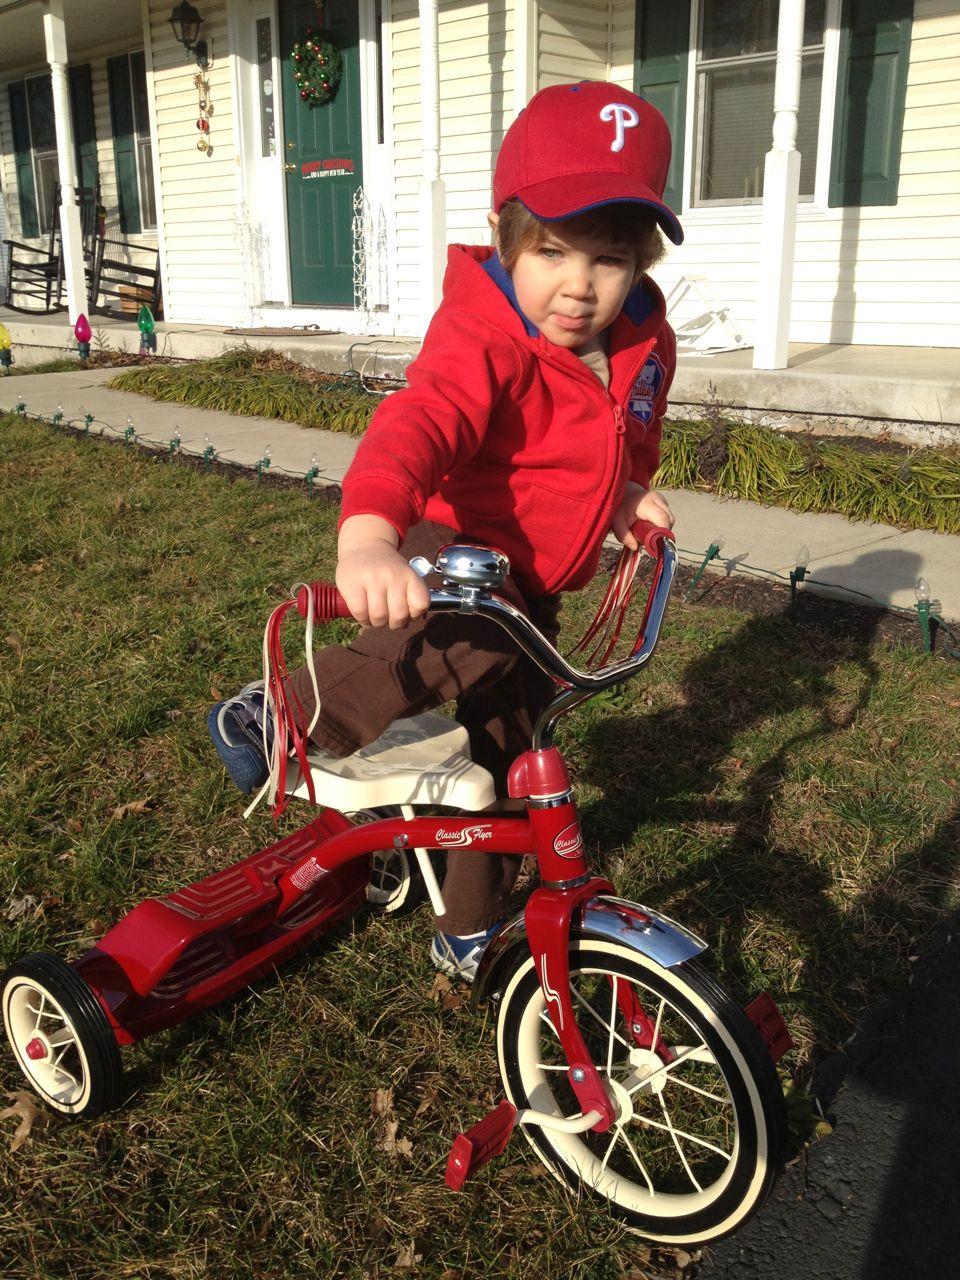 Adam on the bike